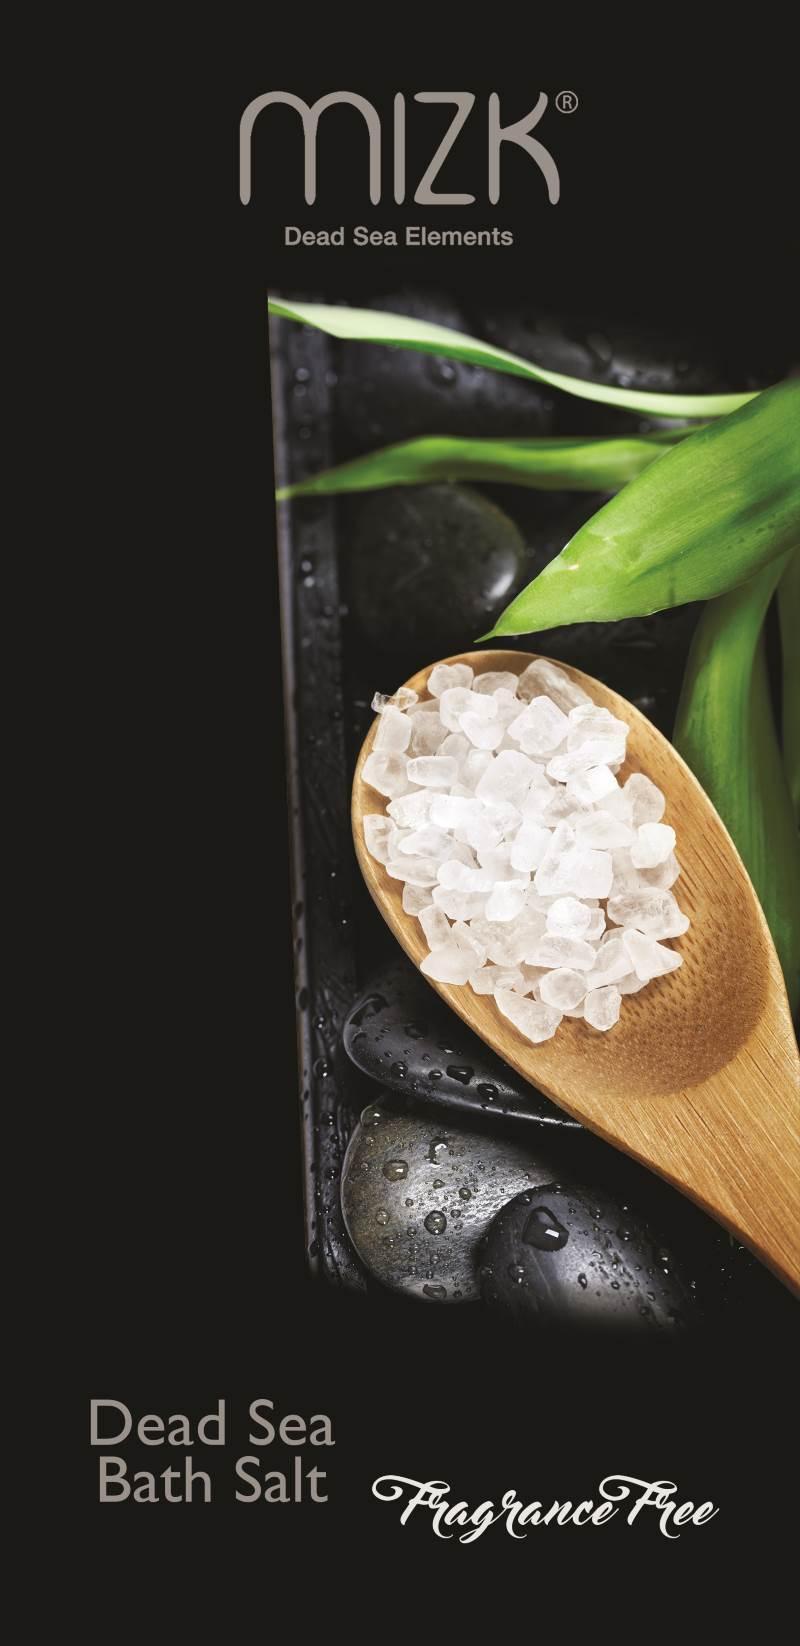 Dead Sea Bath Salt 2